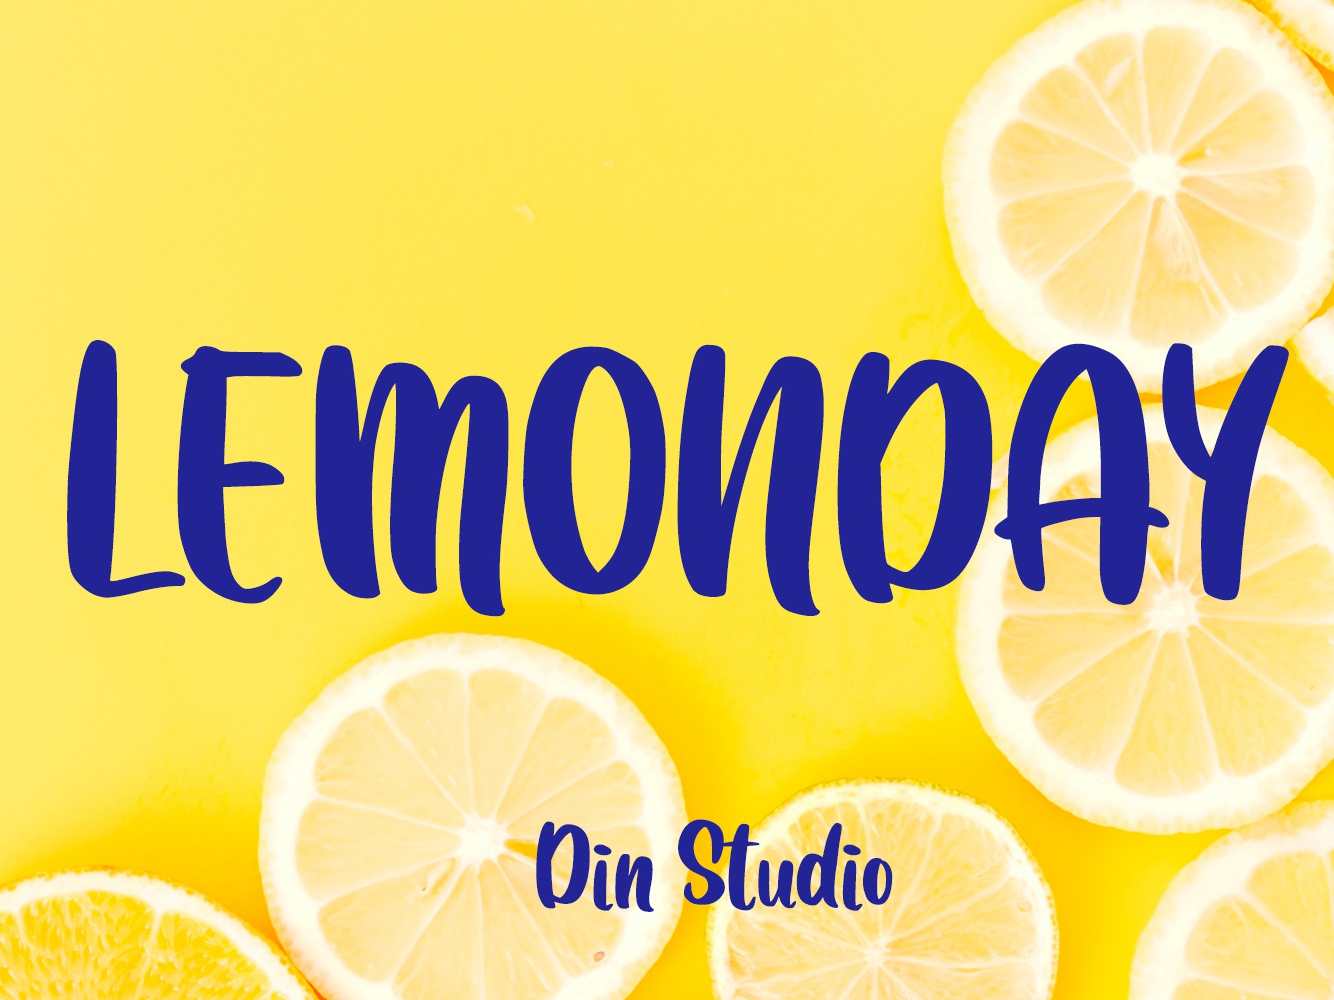 Lemonday Font free font packaging design packaging signature font handlettering logo type typography branding